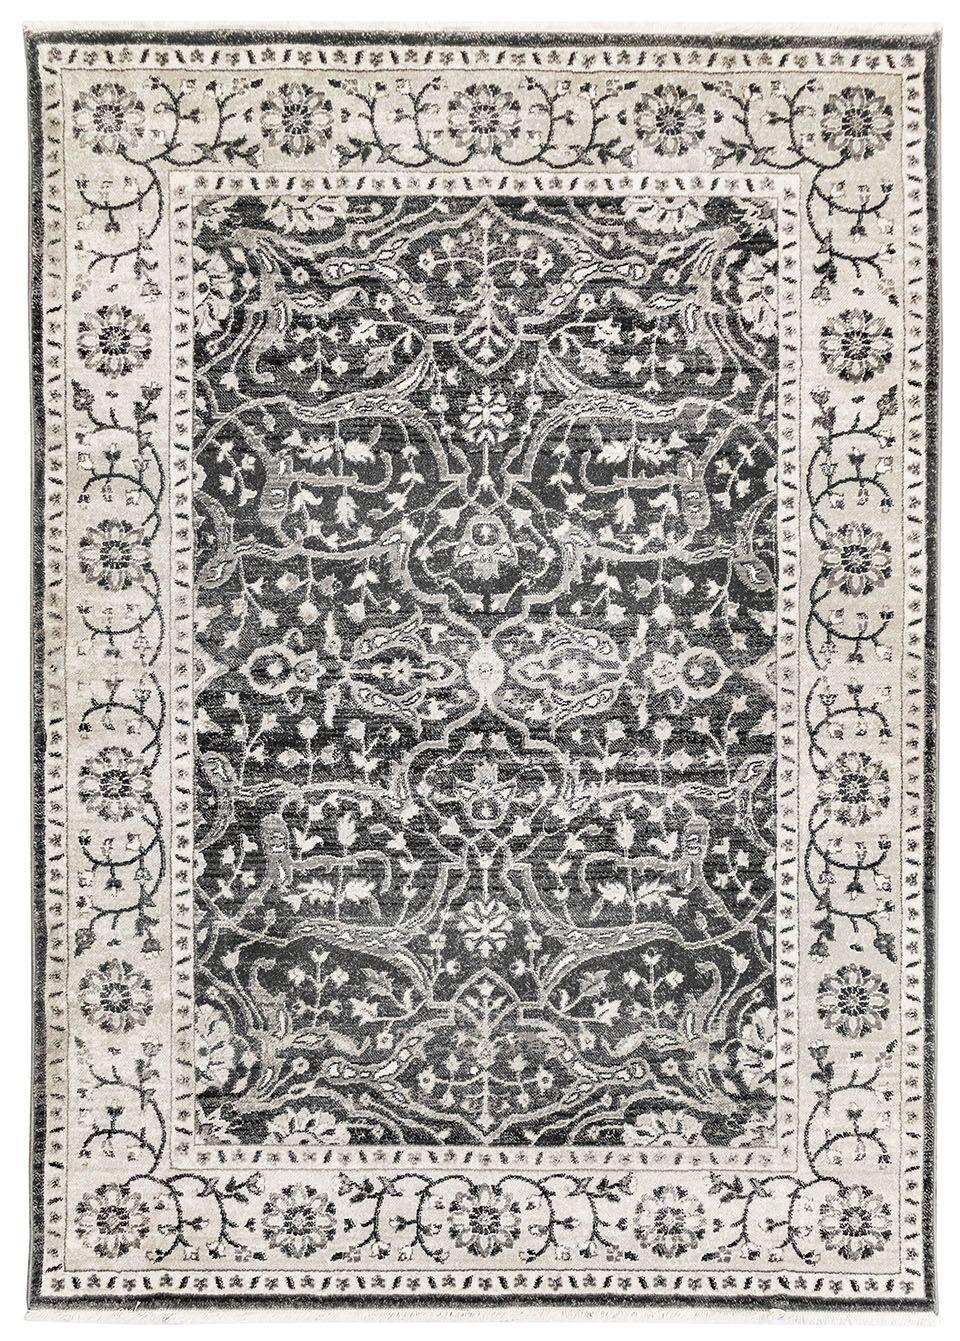 Osblek Oushak Beige/Gray Area Rug Size: Rectangle 8'10